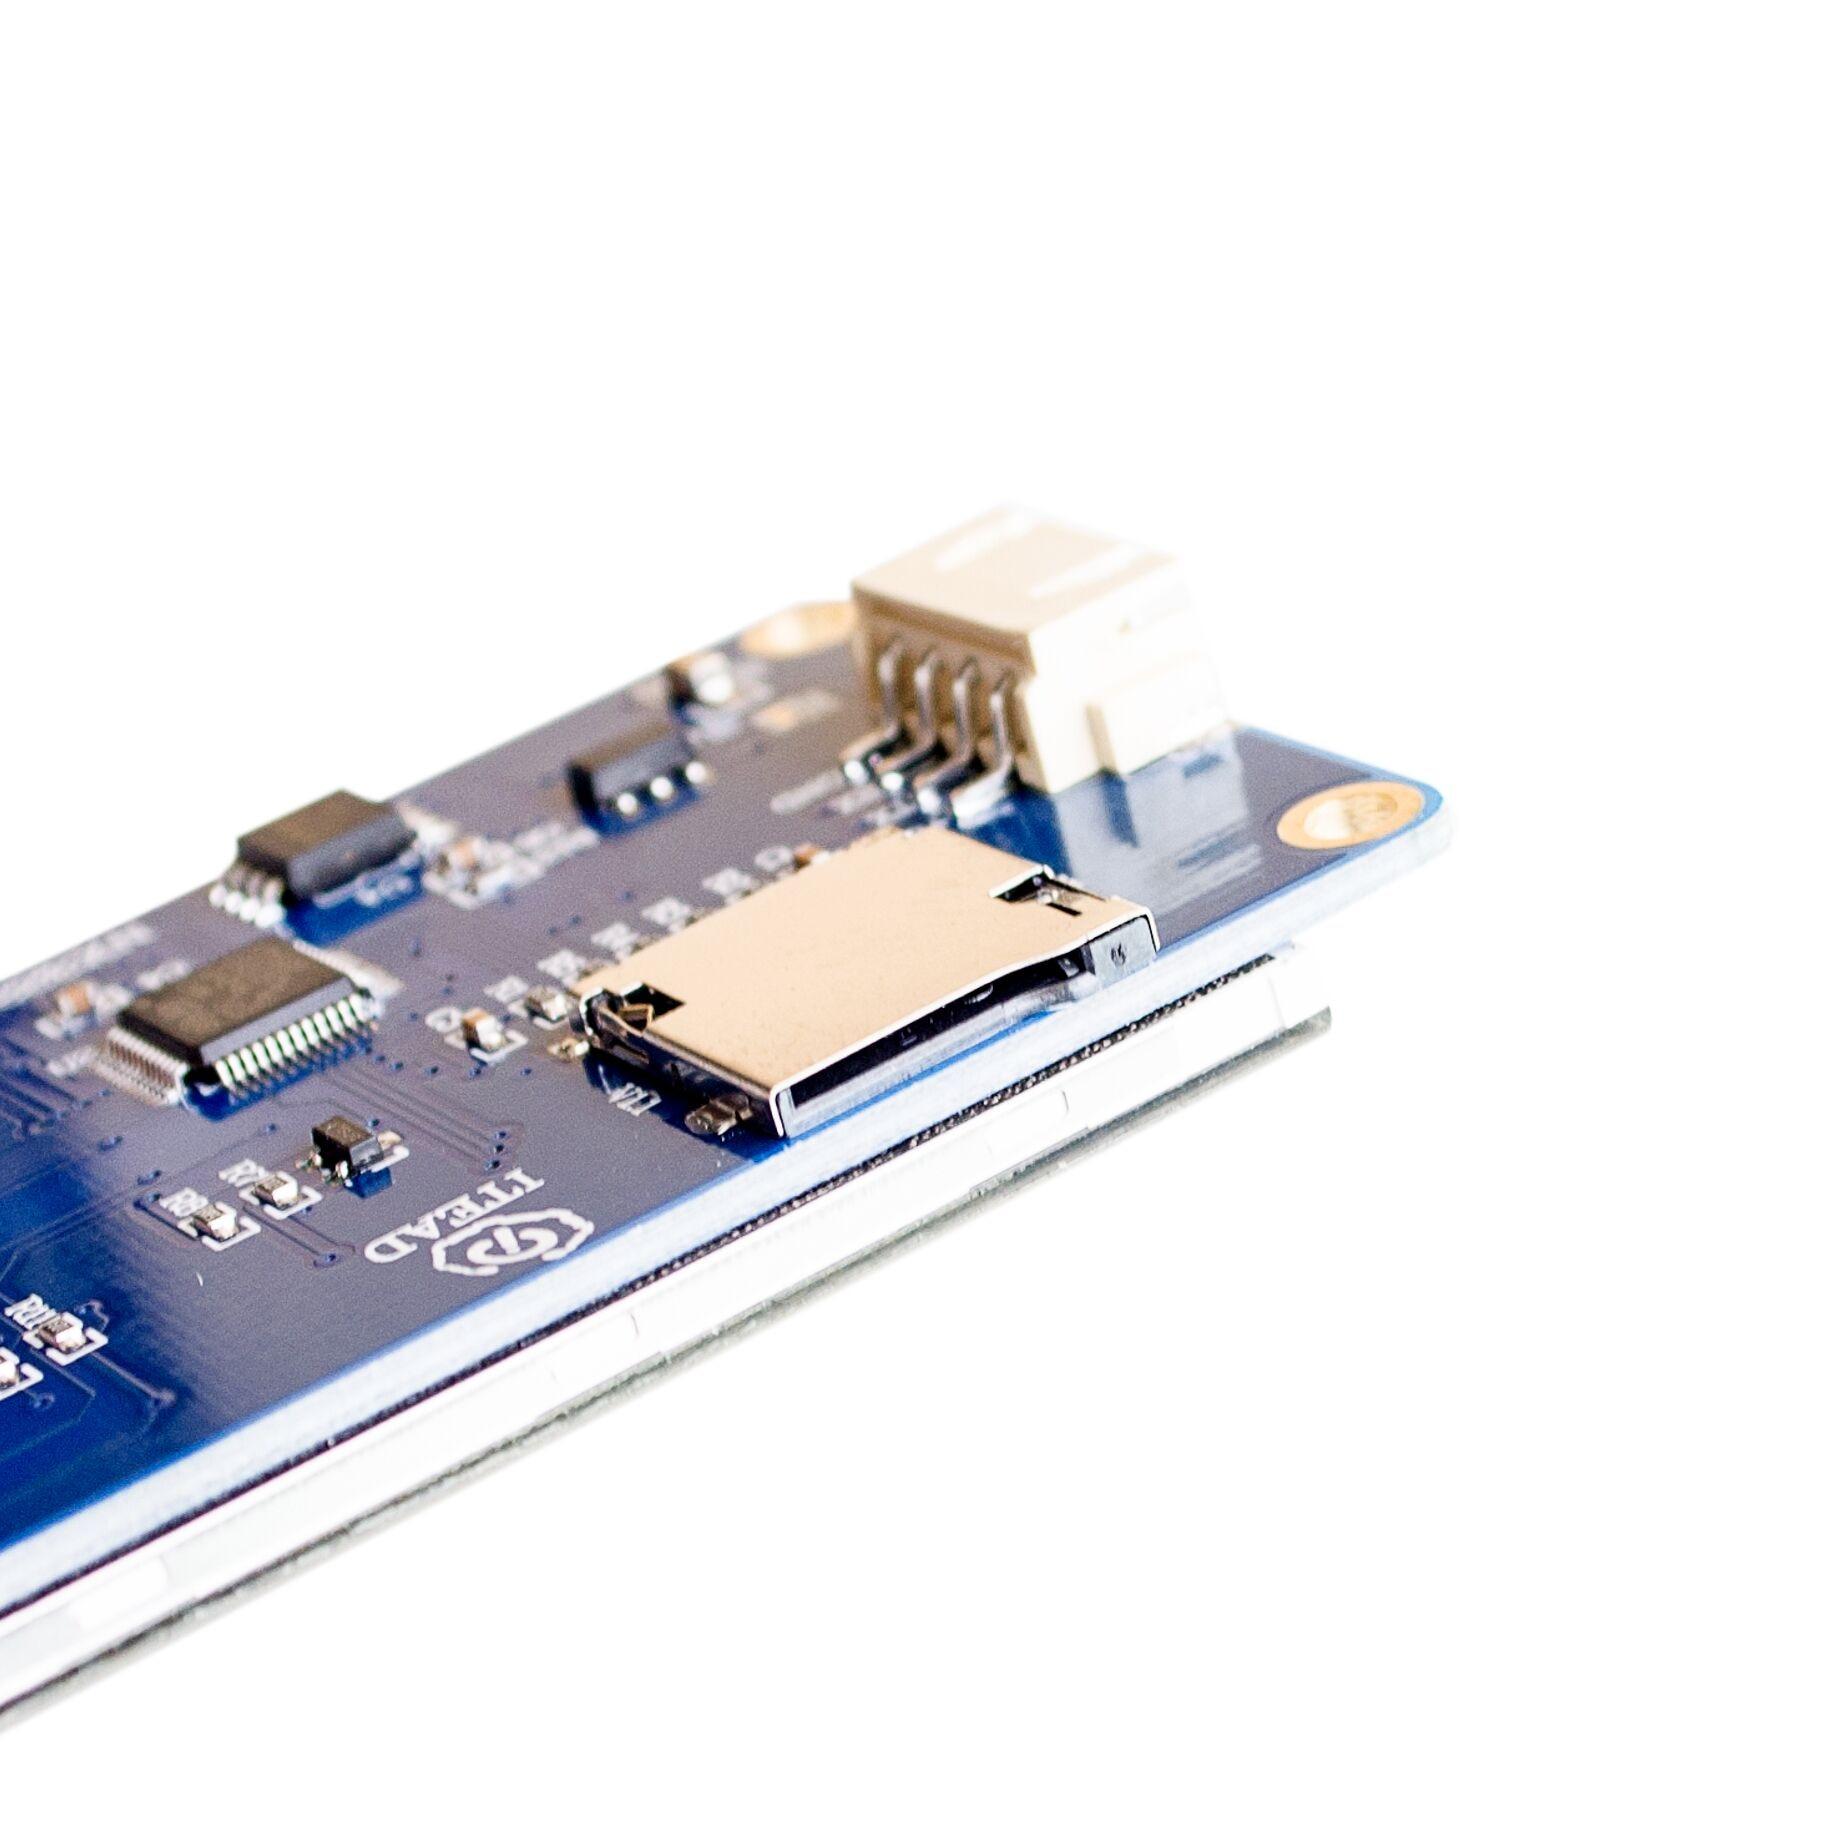 "Image 5 - Nextion 2.4"" TFT 320 x 240 resistive touch screen UART HMI Smart raspberry pi LCD Module Display  TFT Englishraspberry piraspberry pi 2nextion tft lcd -"